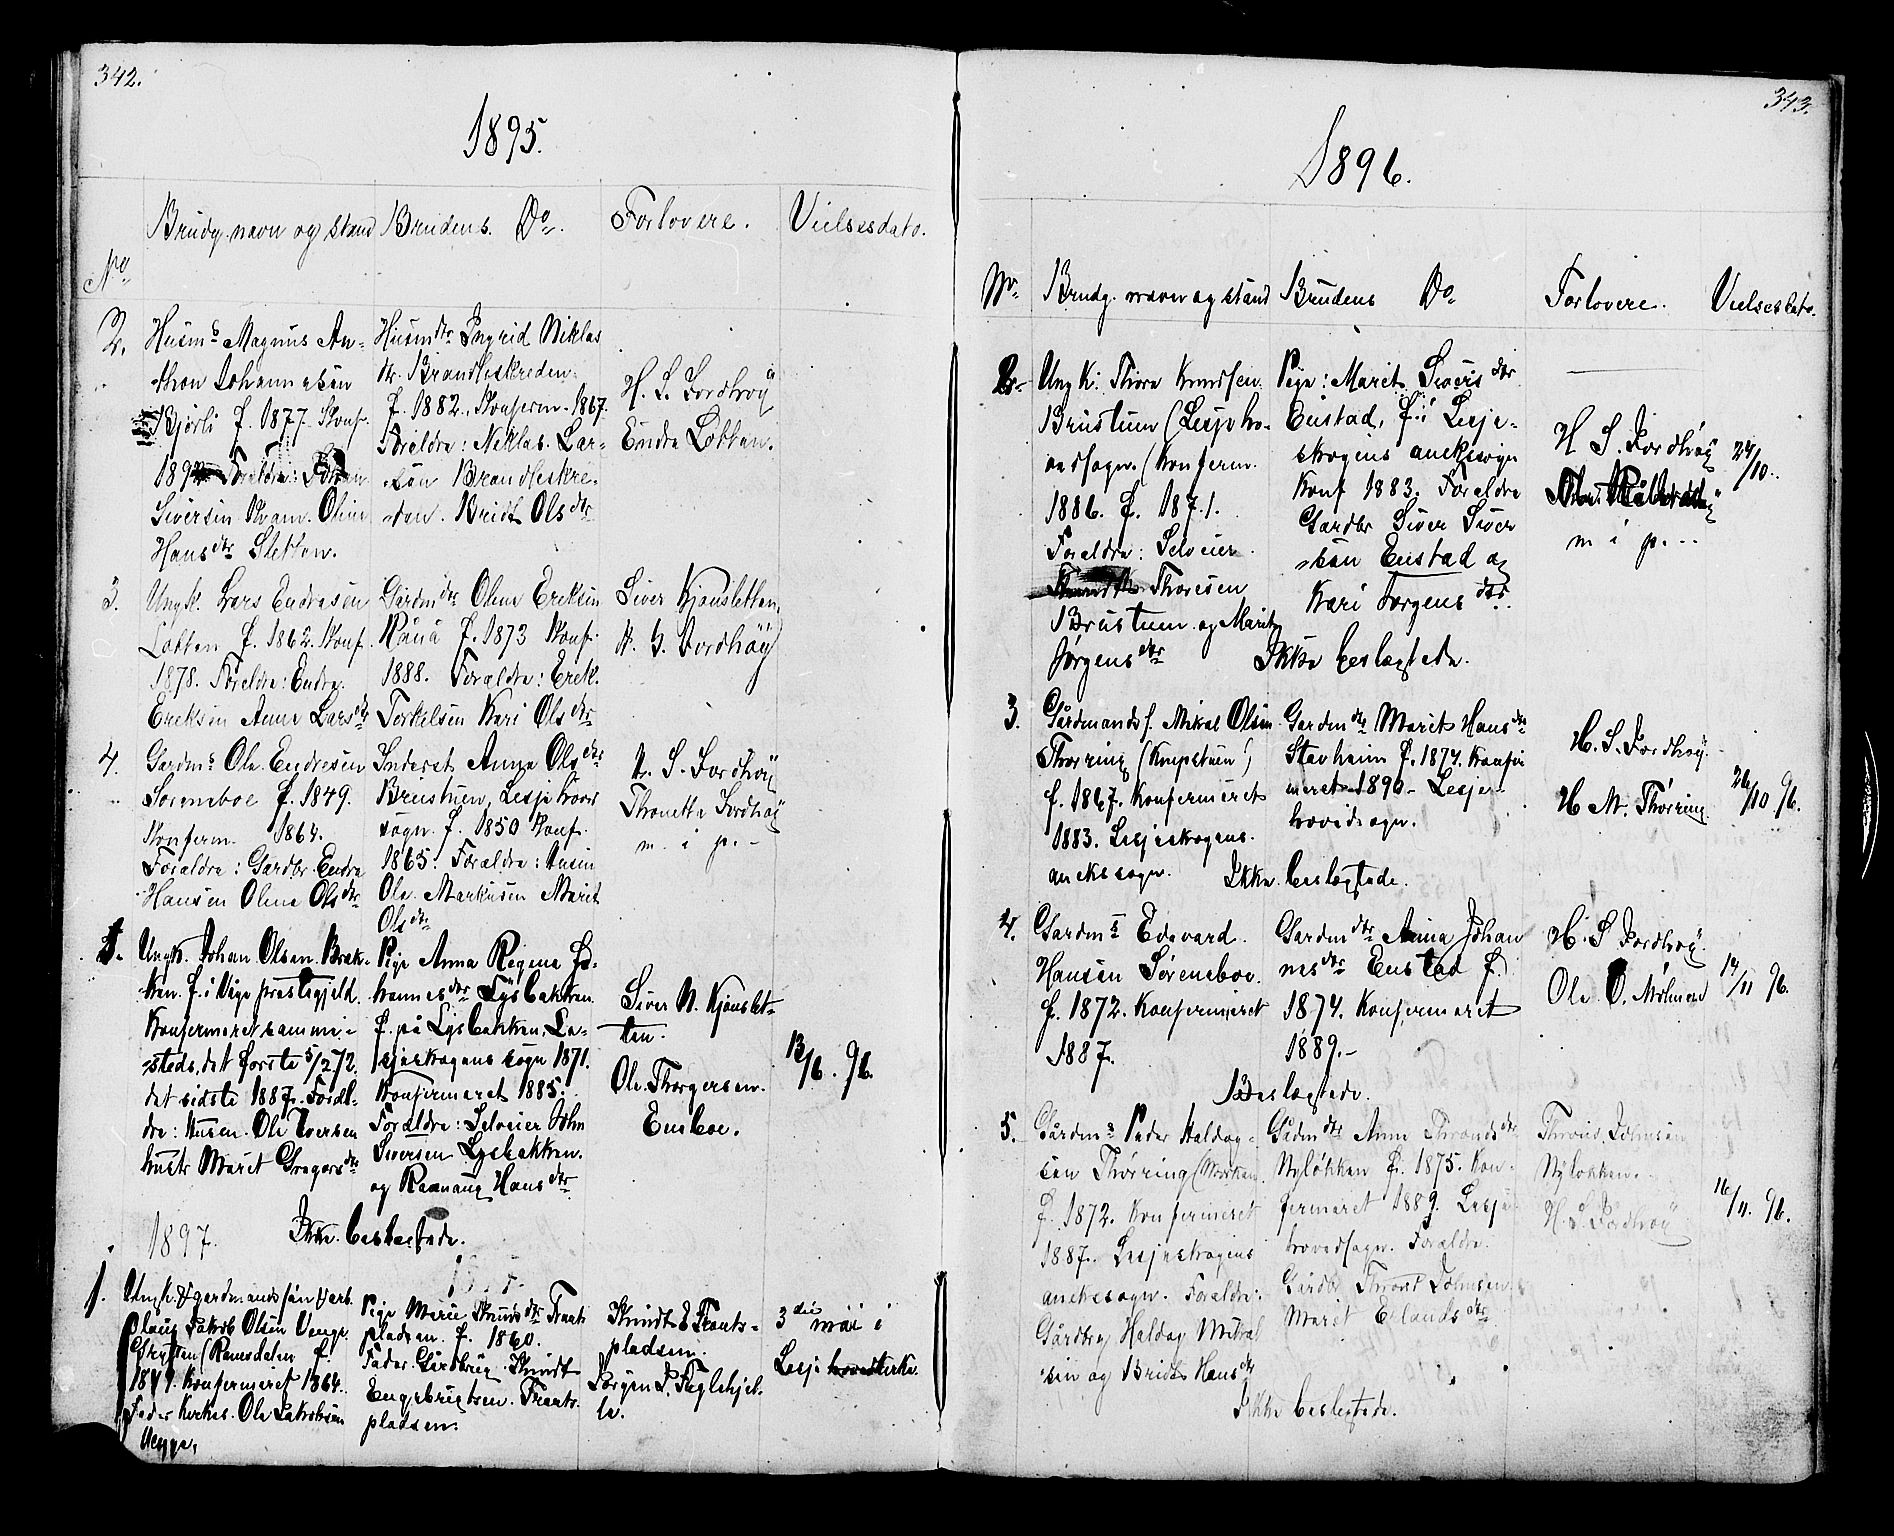 SAH, Lesja prestekontor, Klokkerbok nr. 6, 1871-1904, s. 342-343